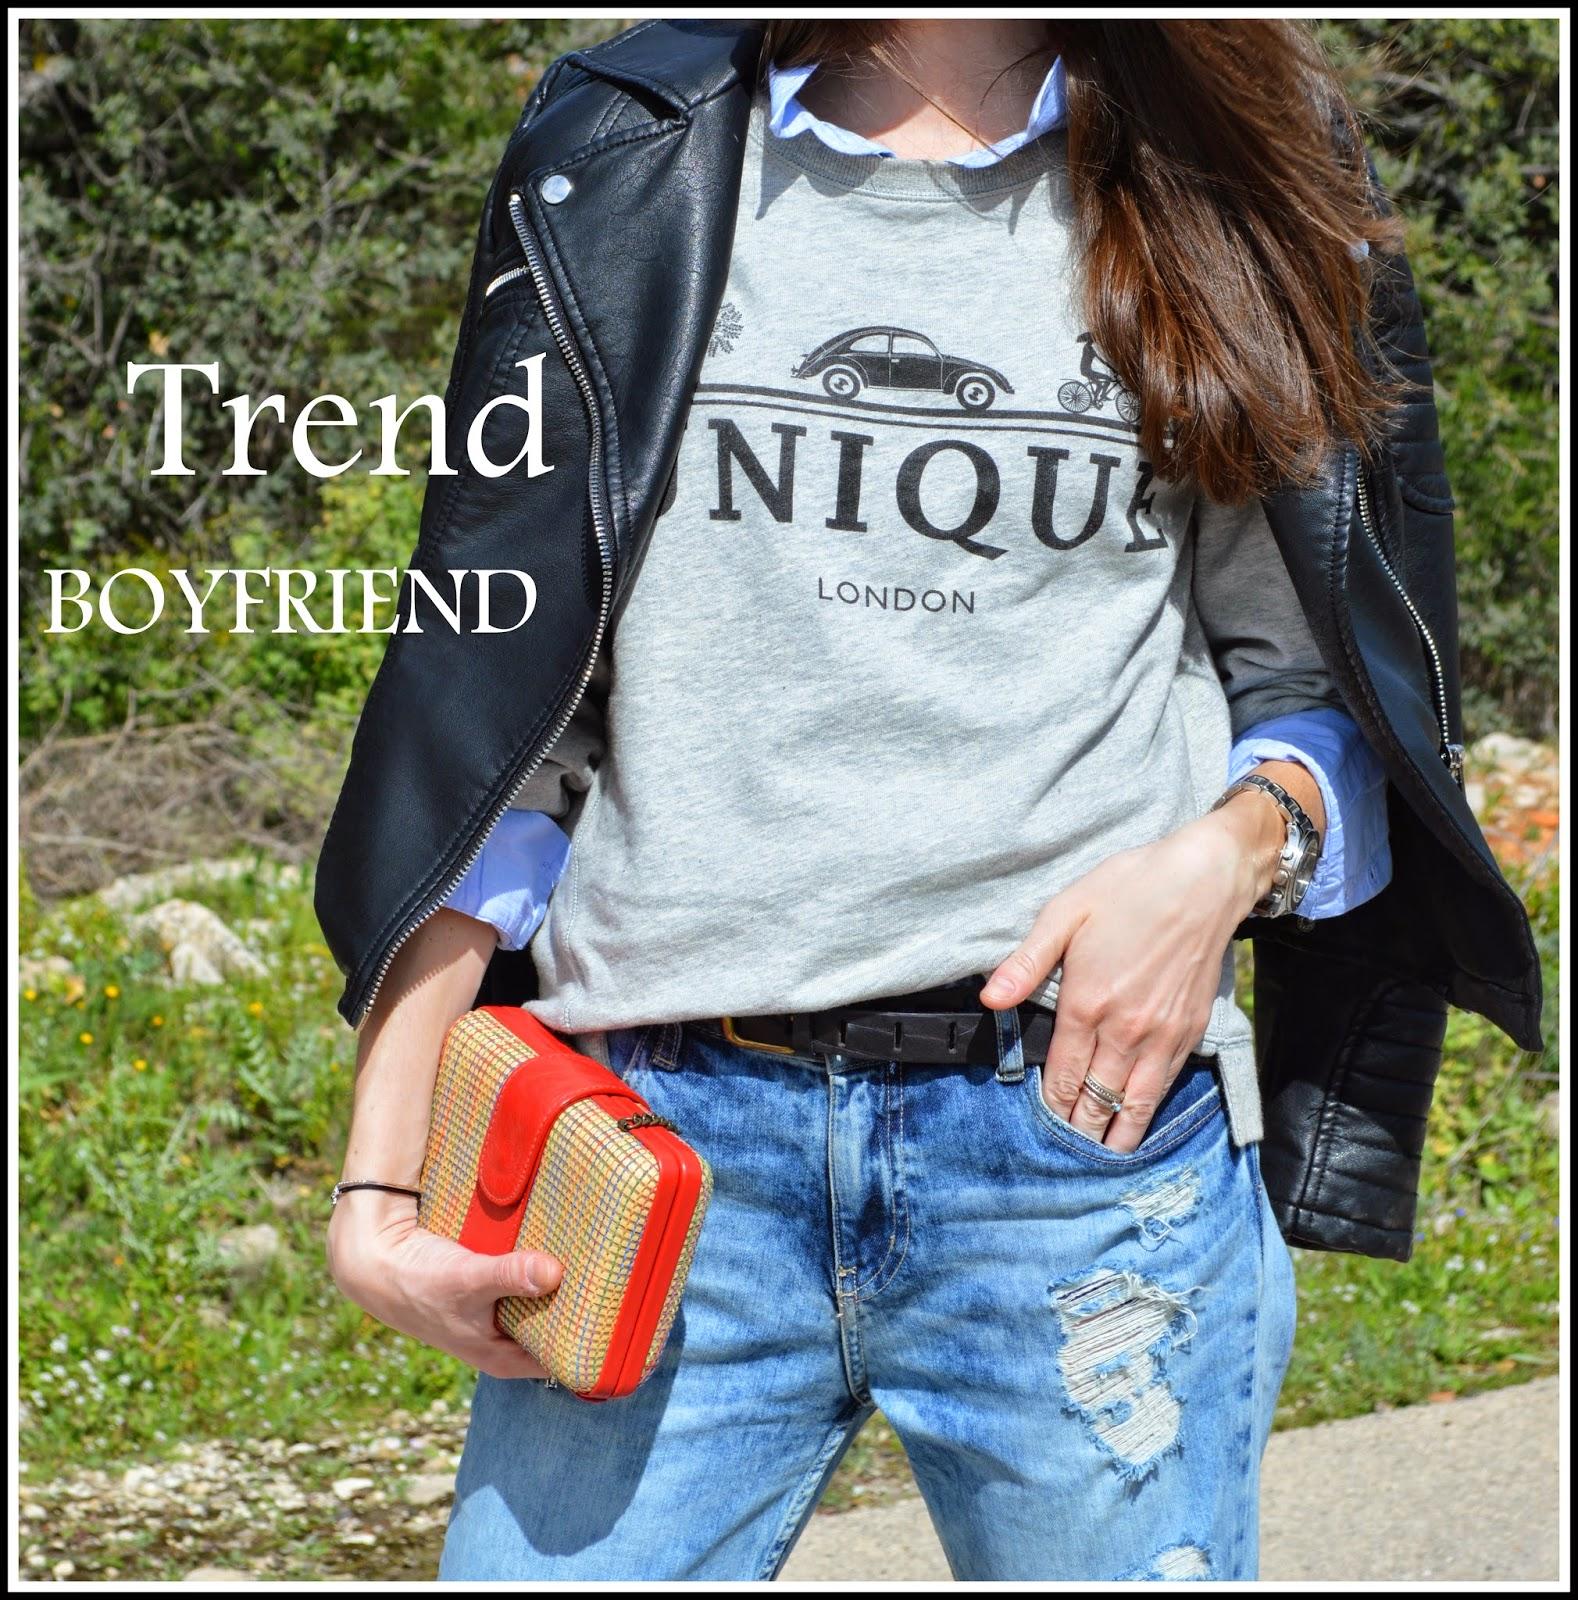 http://lookfortime.blogspot.com.es/2015/04/boyfriend-trend.html#more